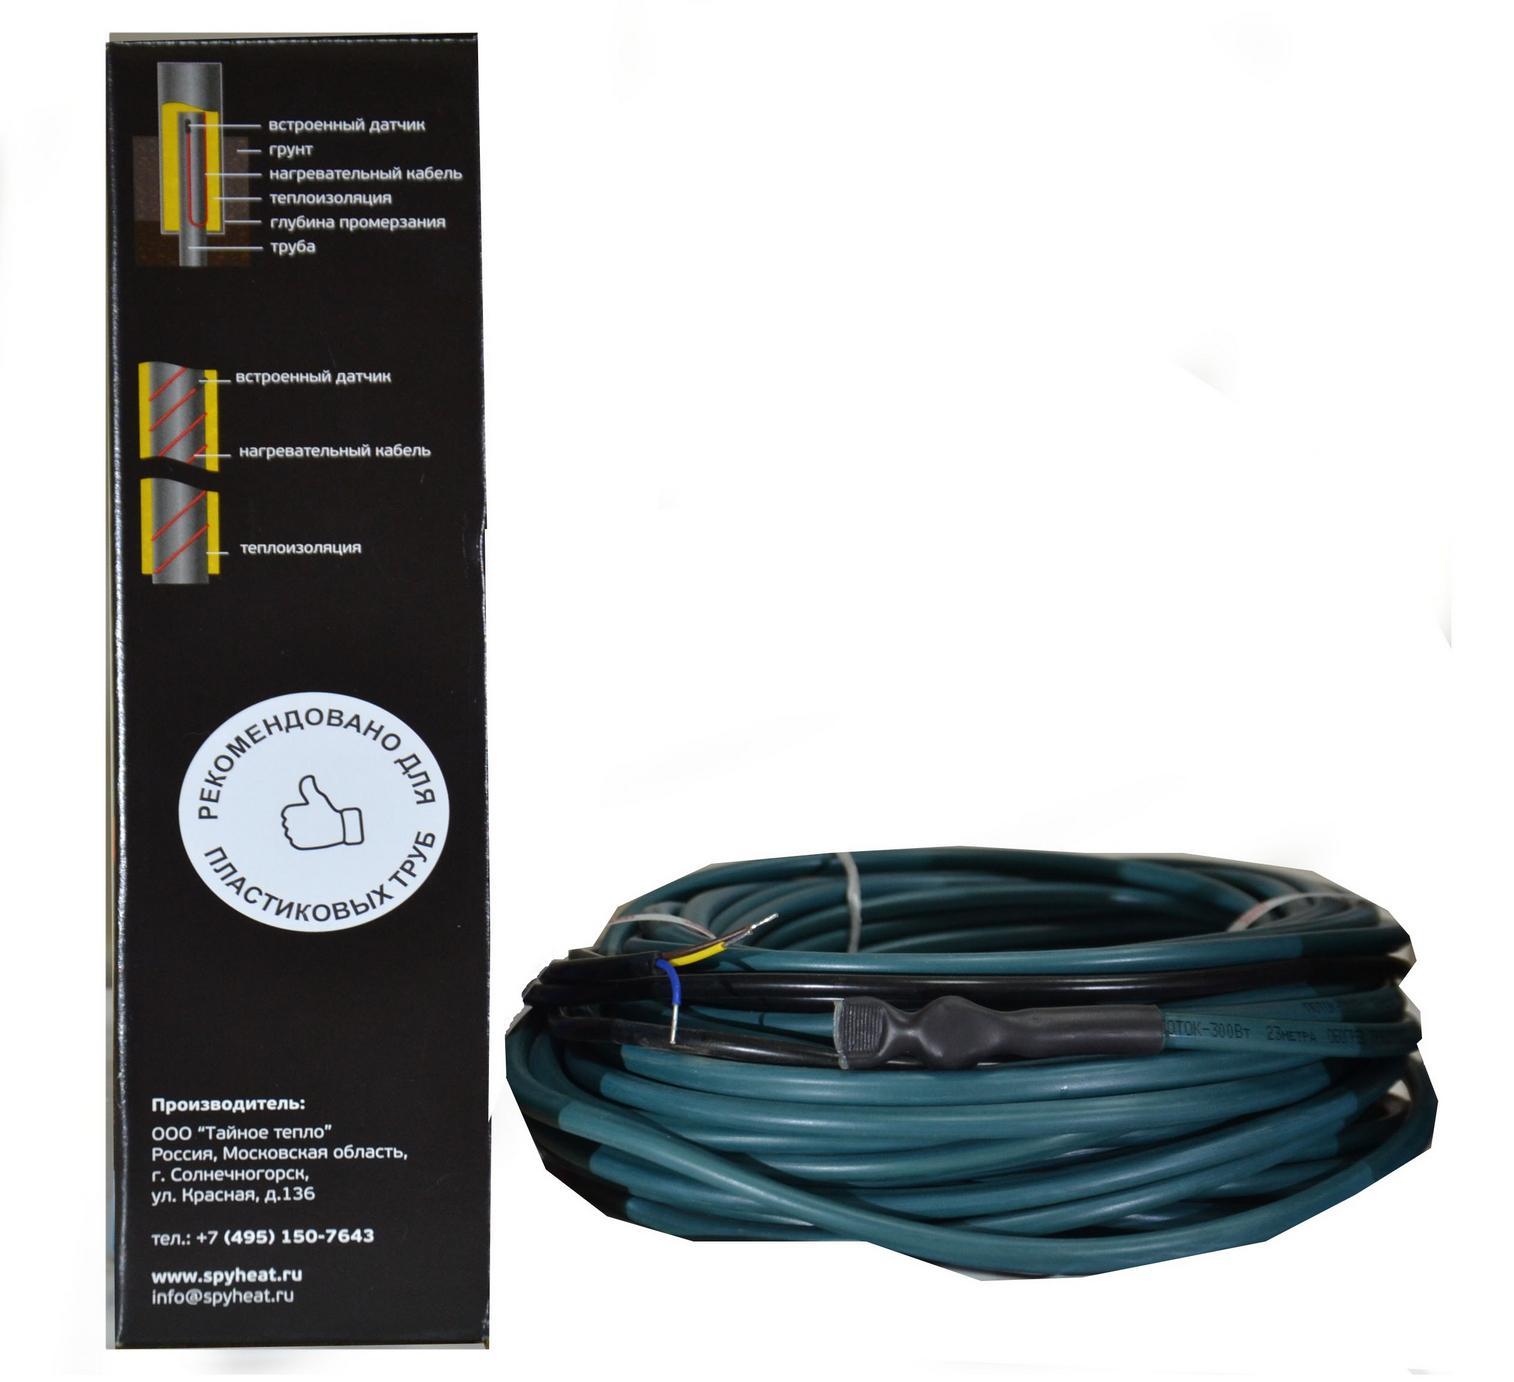 Греющий кабель Spyheat ПОТОК shfd-13-55